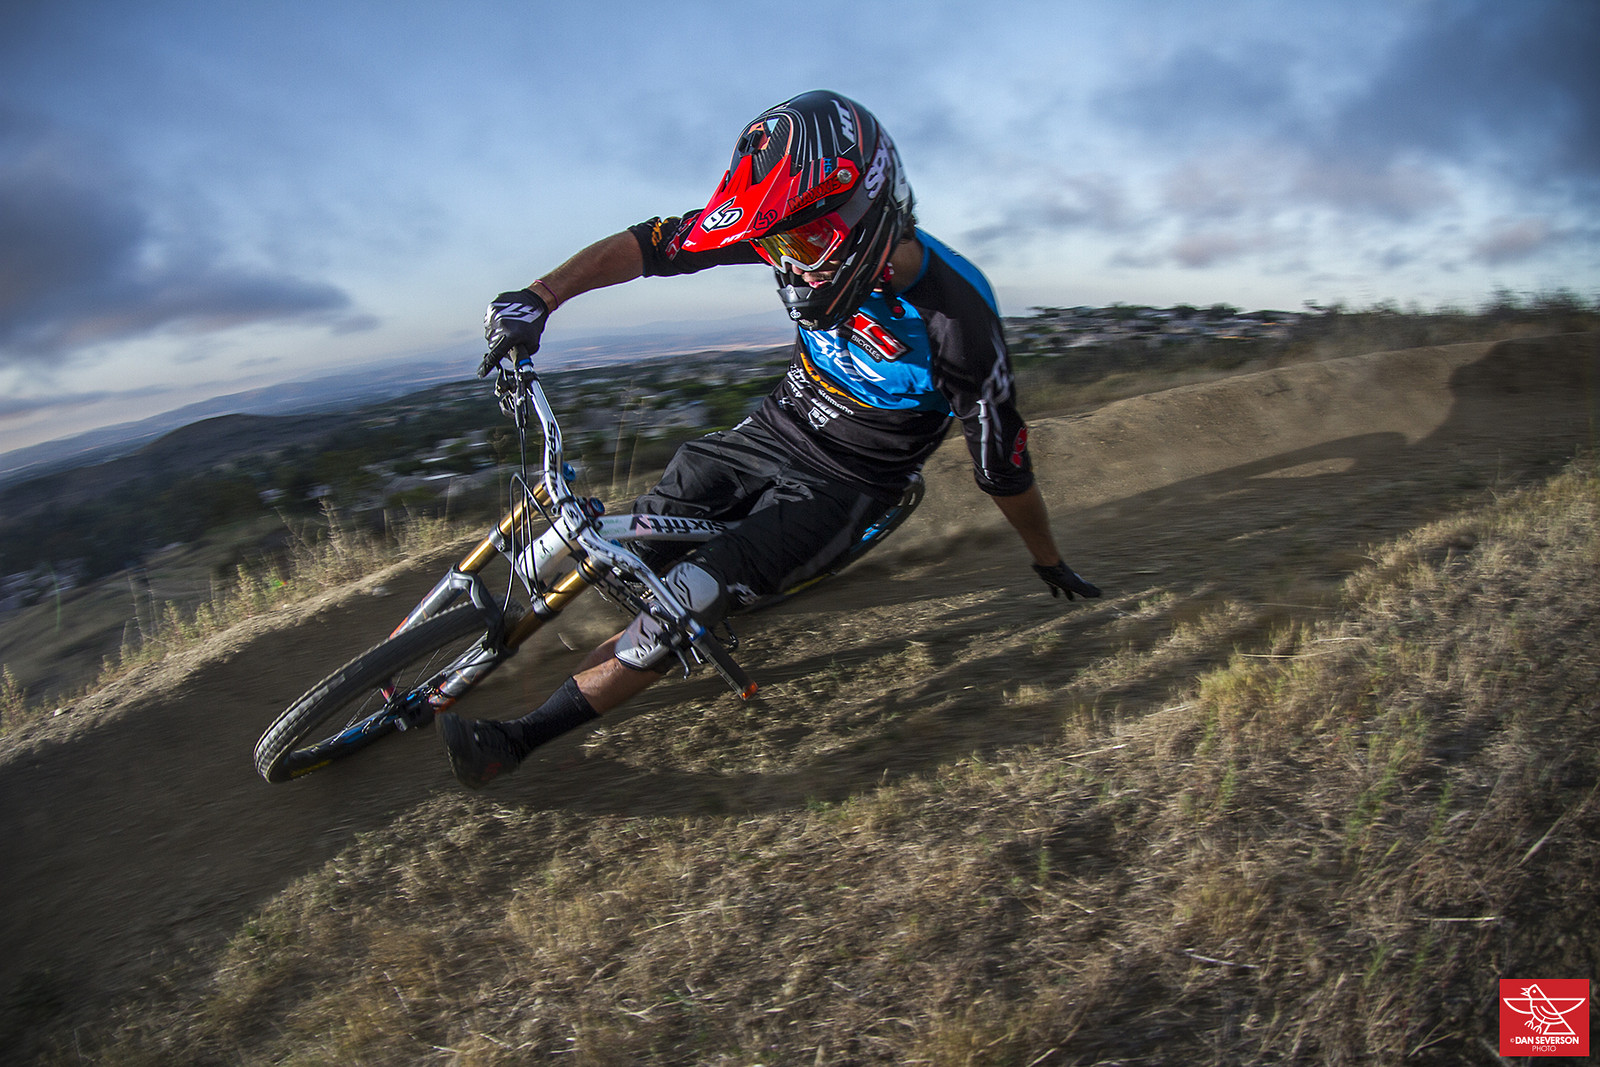 Laid back - danseverson photo - Mountain Biking Pictures - Vital MTB